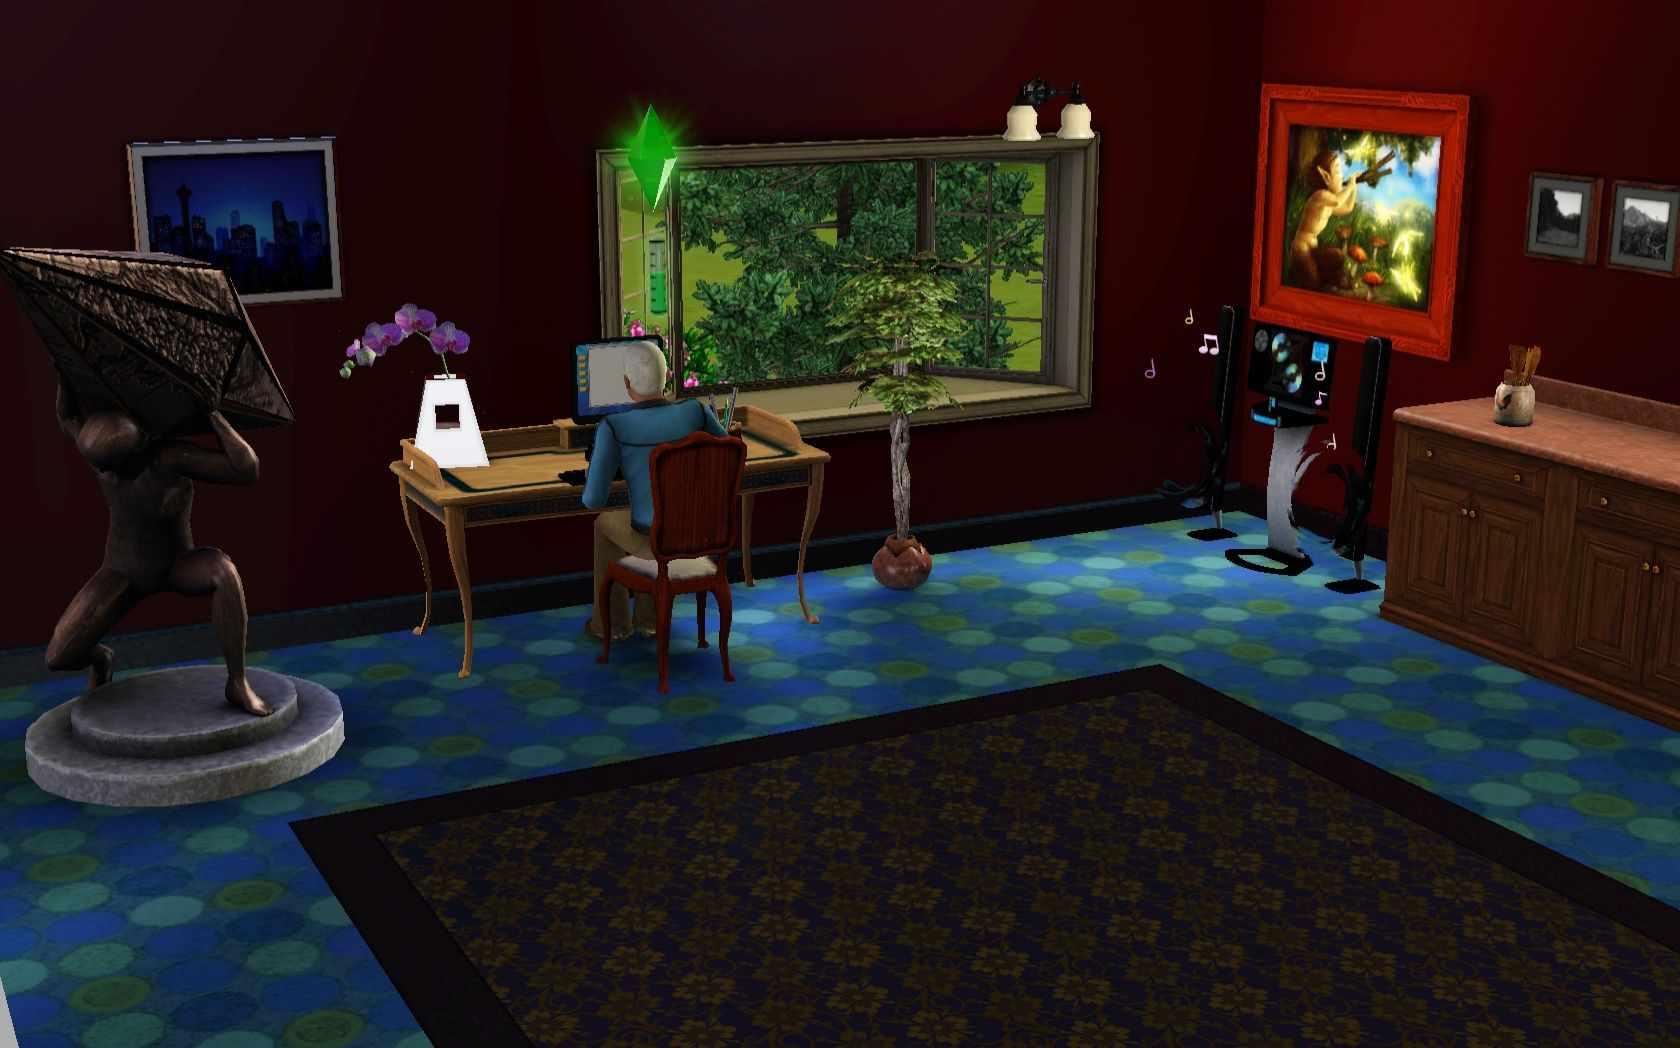 Sims 3 Writing Skill: Books, Money and Writer Career